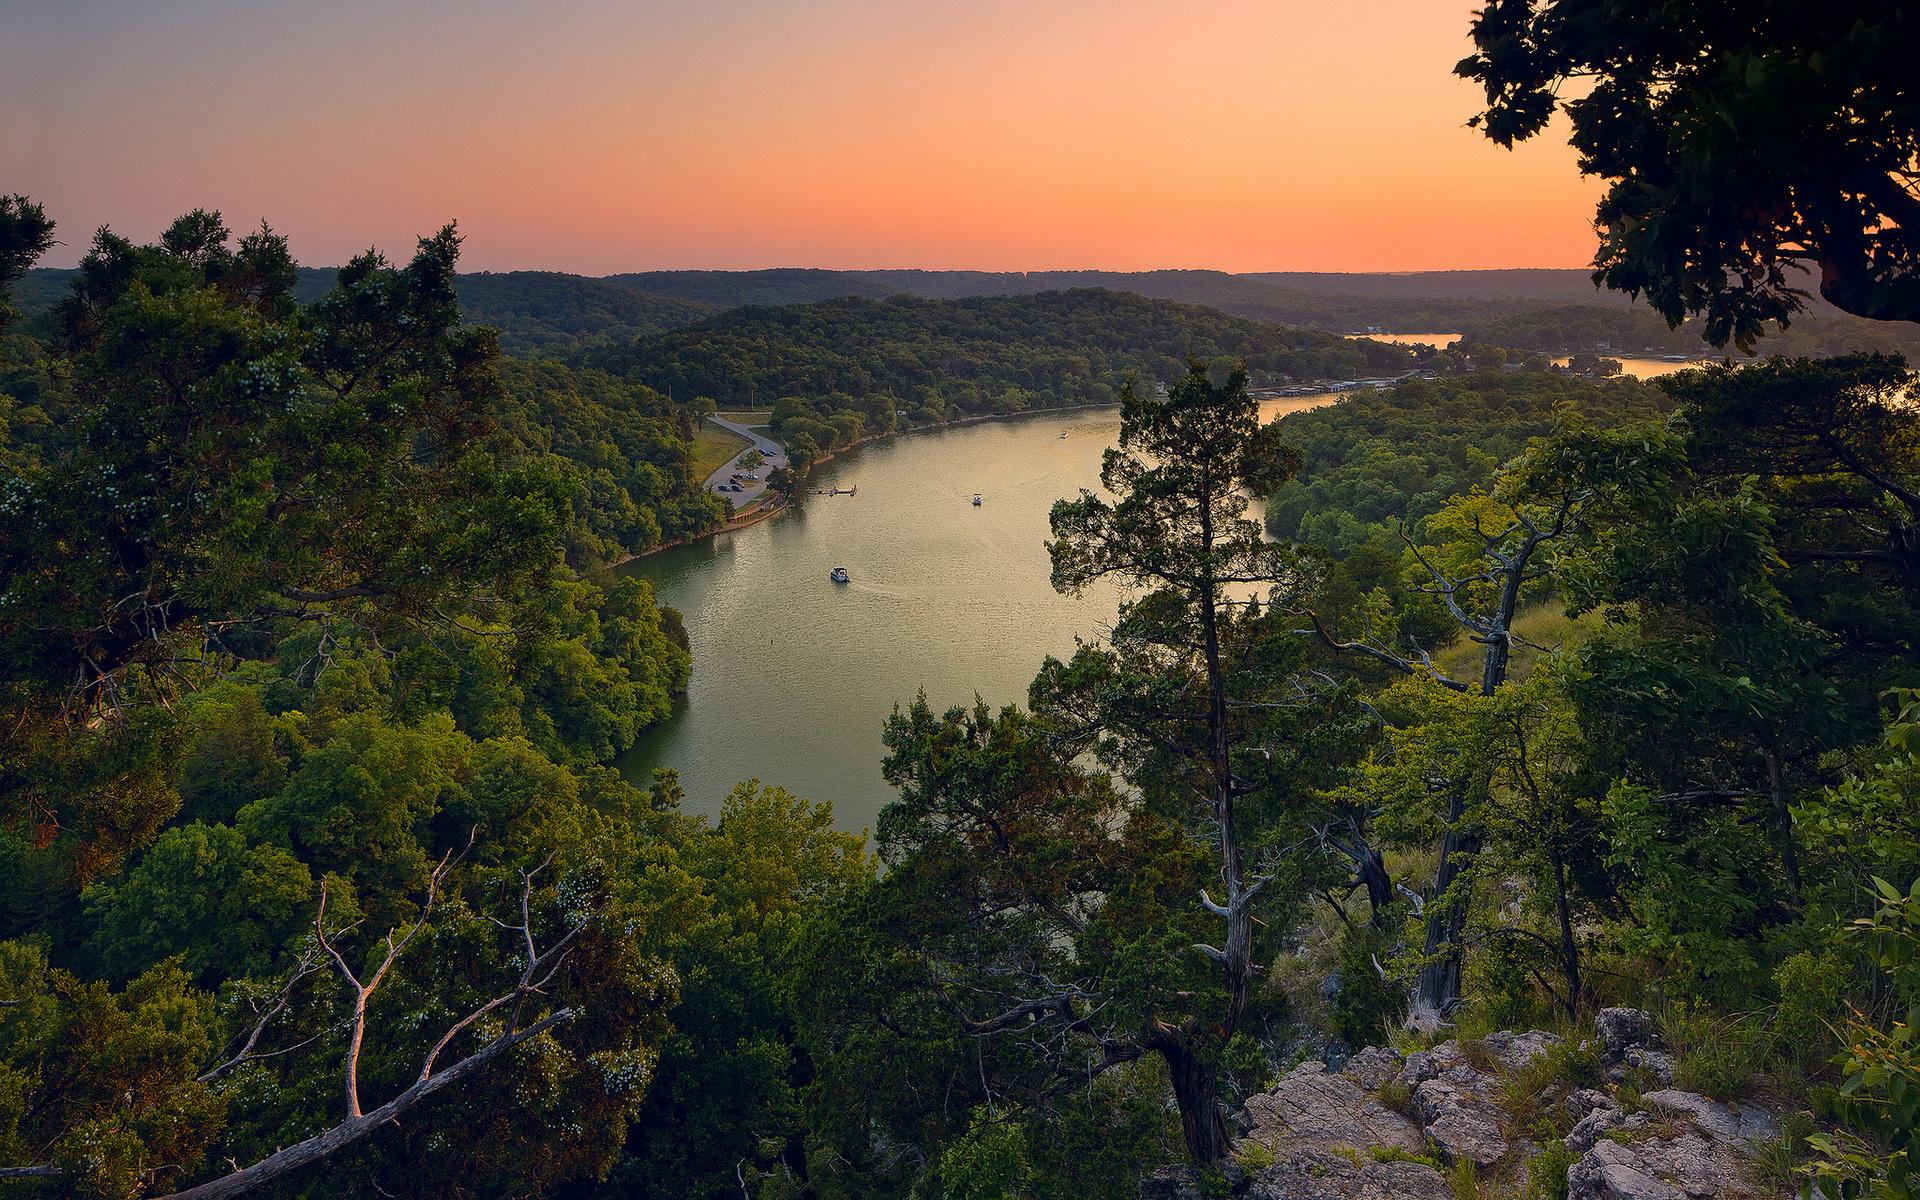 Lake Ozark Missouri >> Landscape HD Wallpaper | Background Image | 1920x1200 | ID:301903 - Wallpaper Abyss